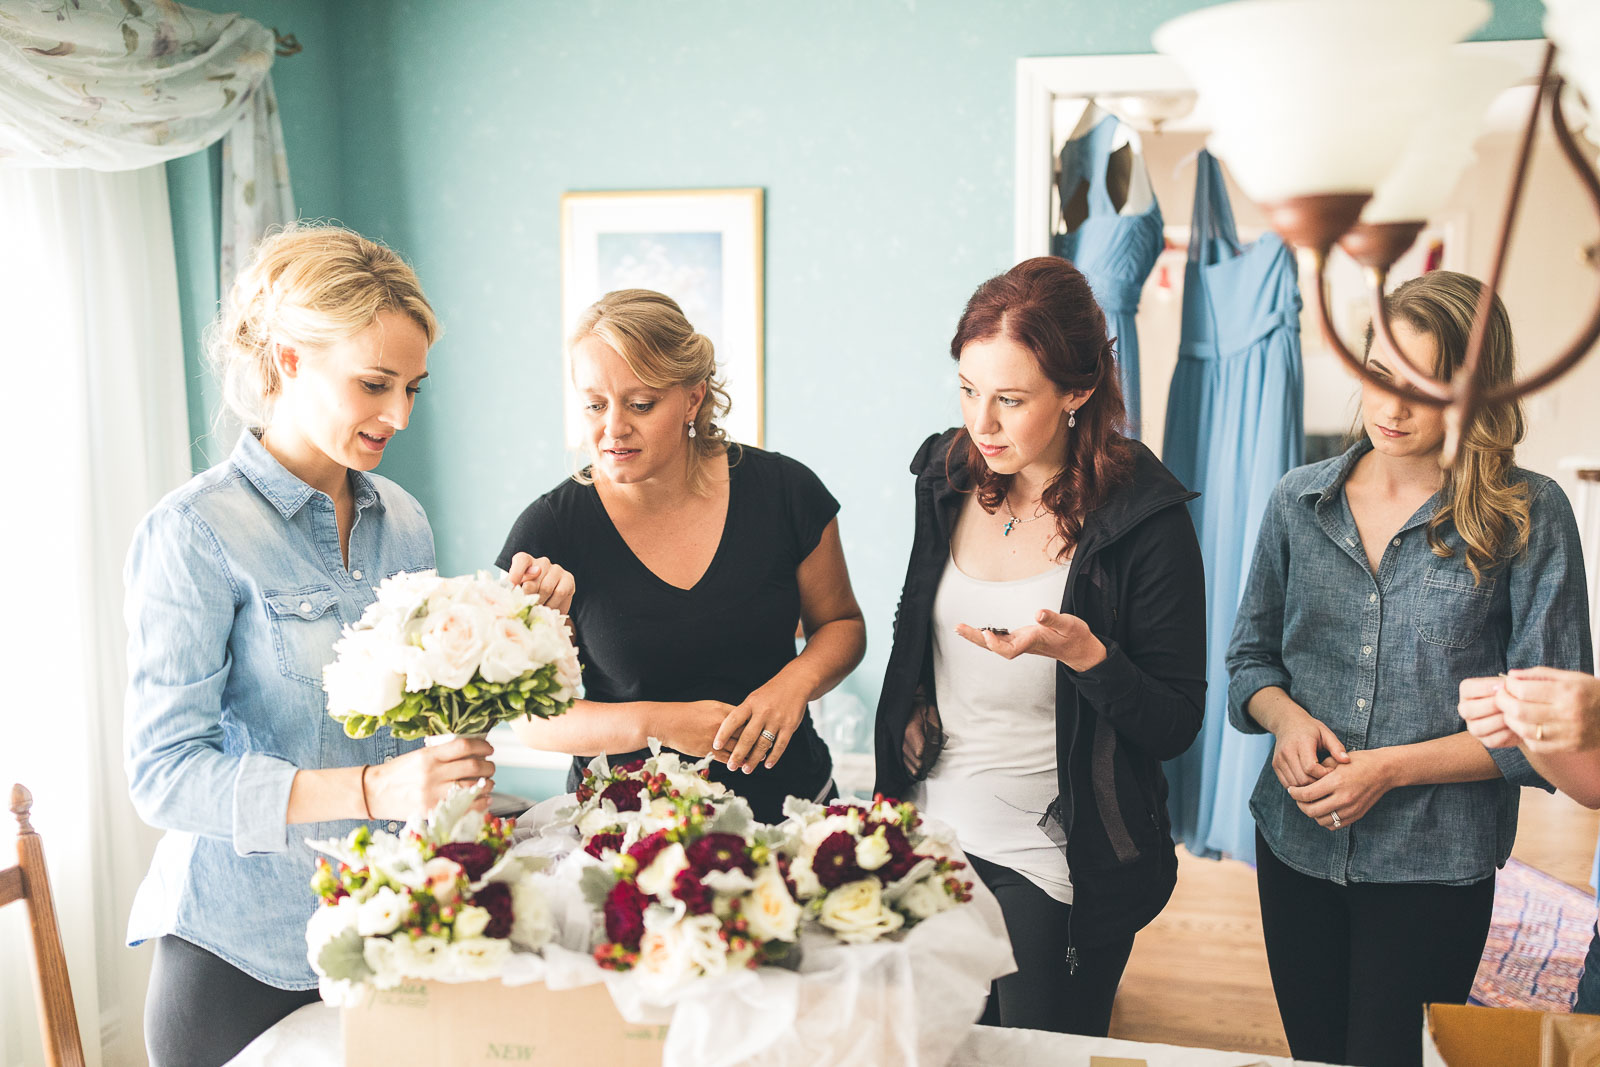 Bride looks at flowers